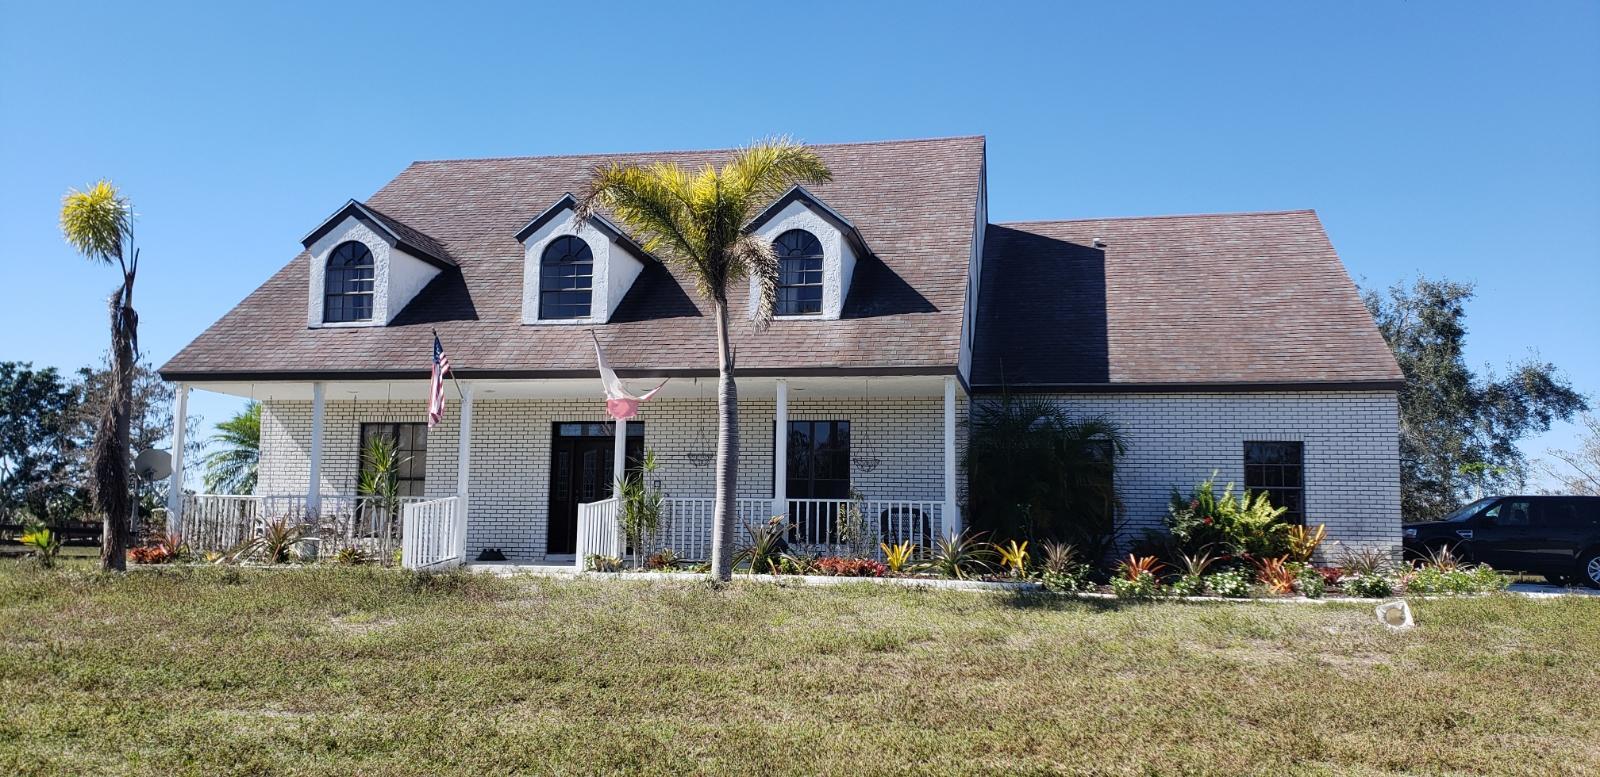 Photo of 2199 Palm Deer Drive, Loxahatchee, FL 33470